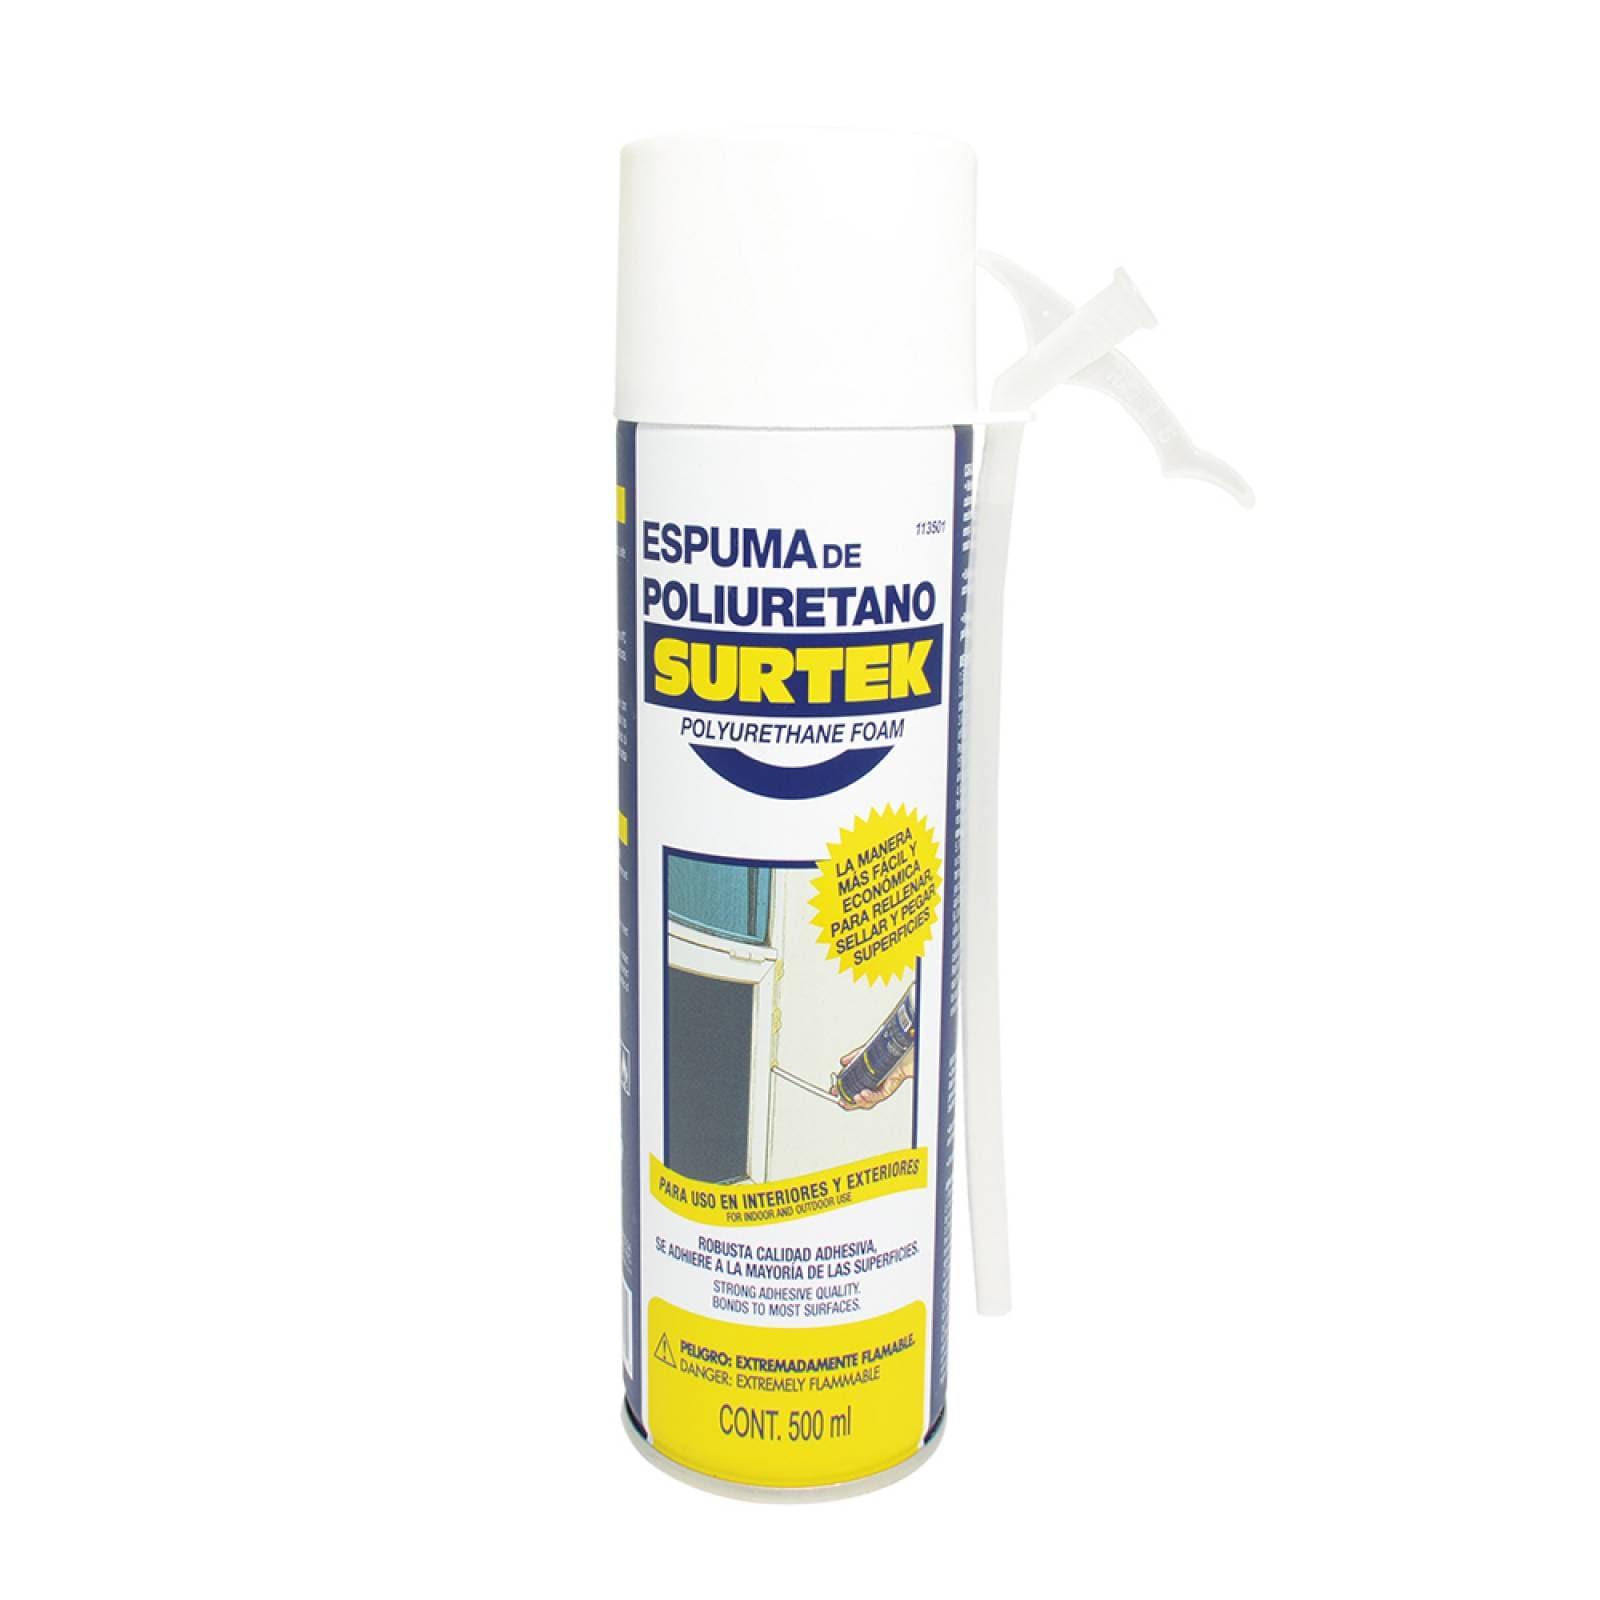 Espuma de poliuretano uso industrial 500 ml 113501 Surtek